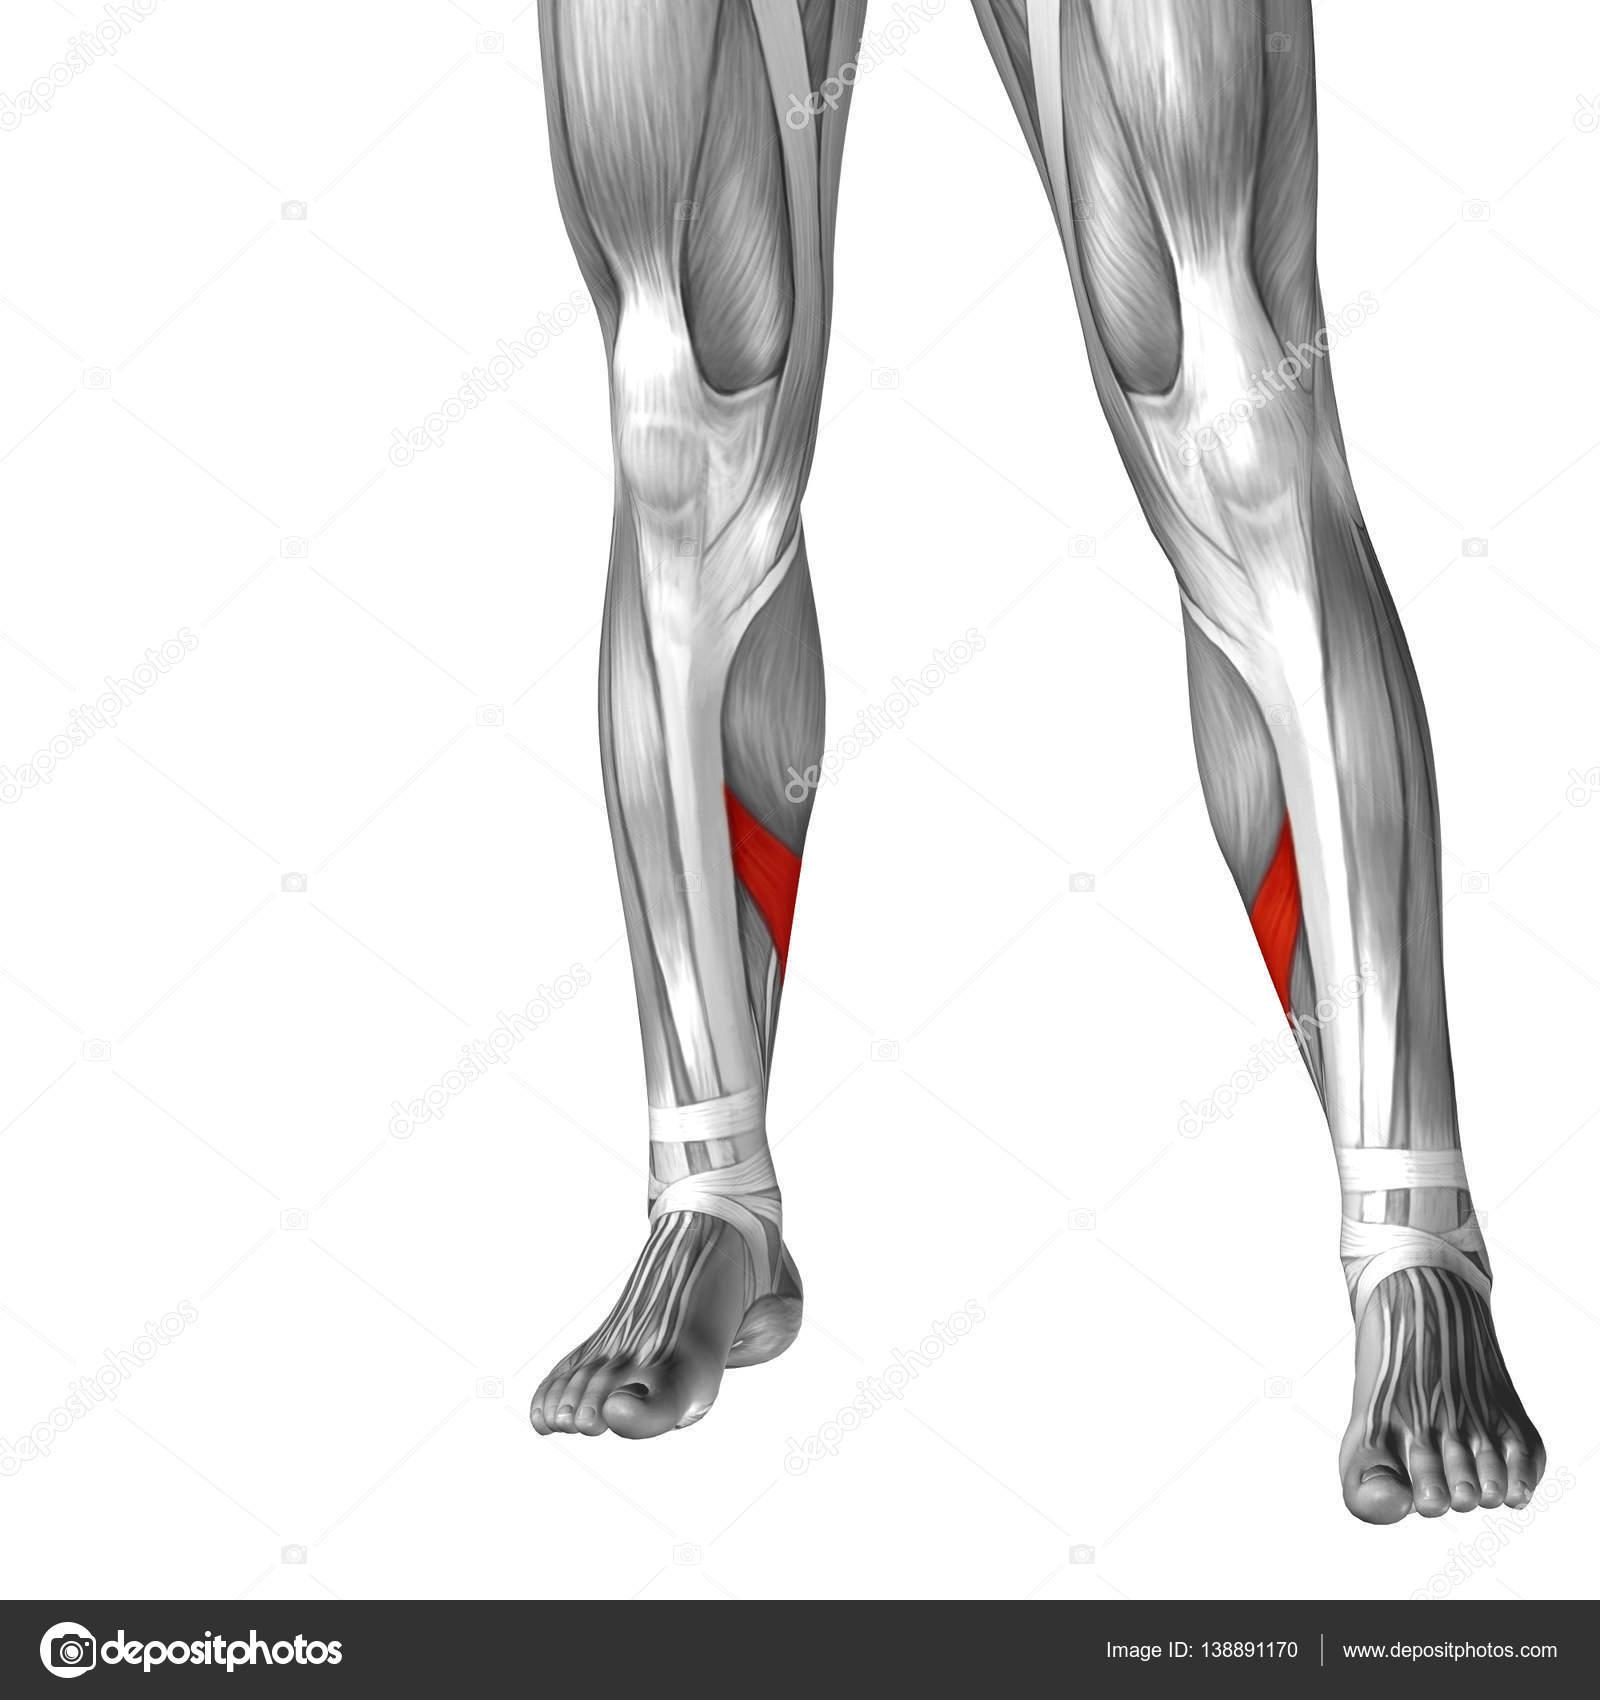 Human Lower Leg Anatomy Stock Photo Design36 138891170